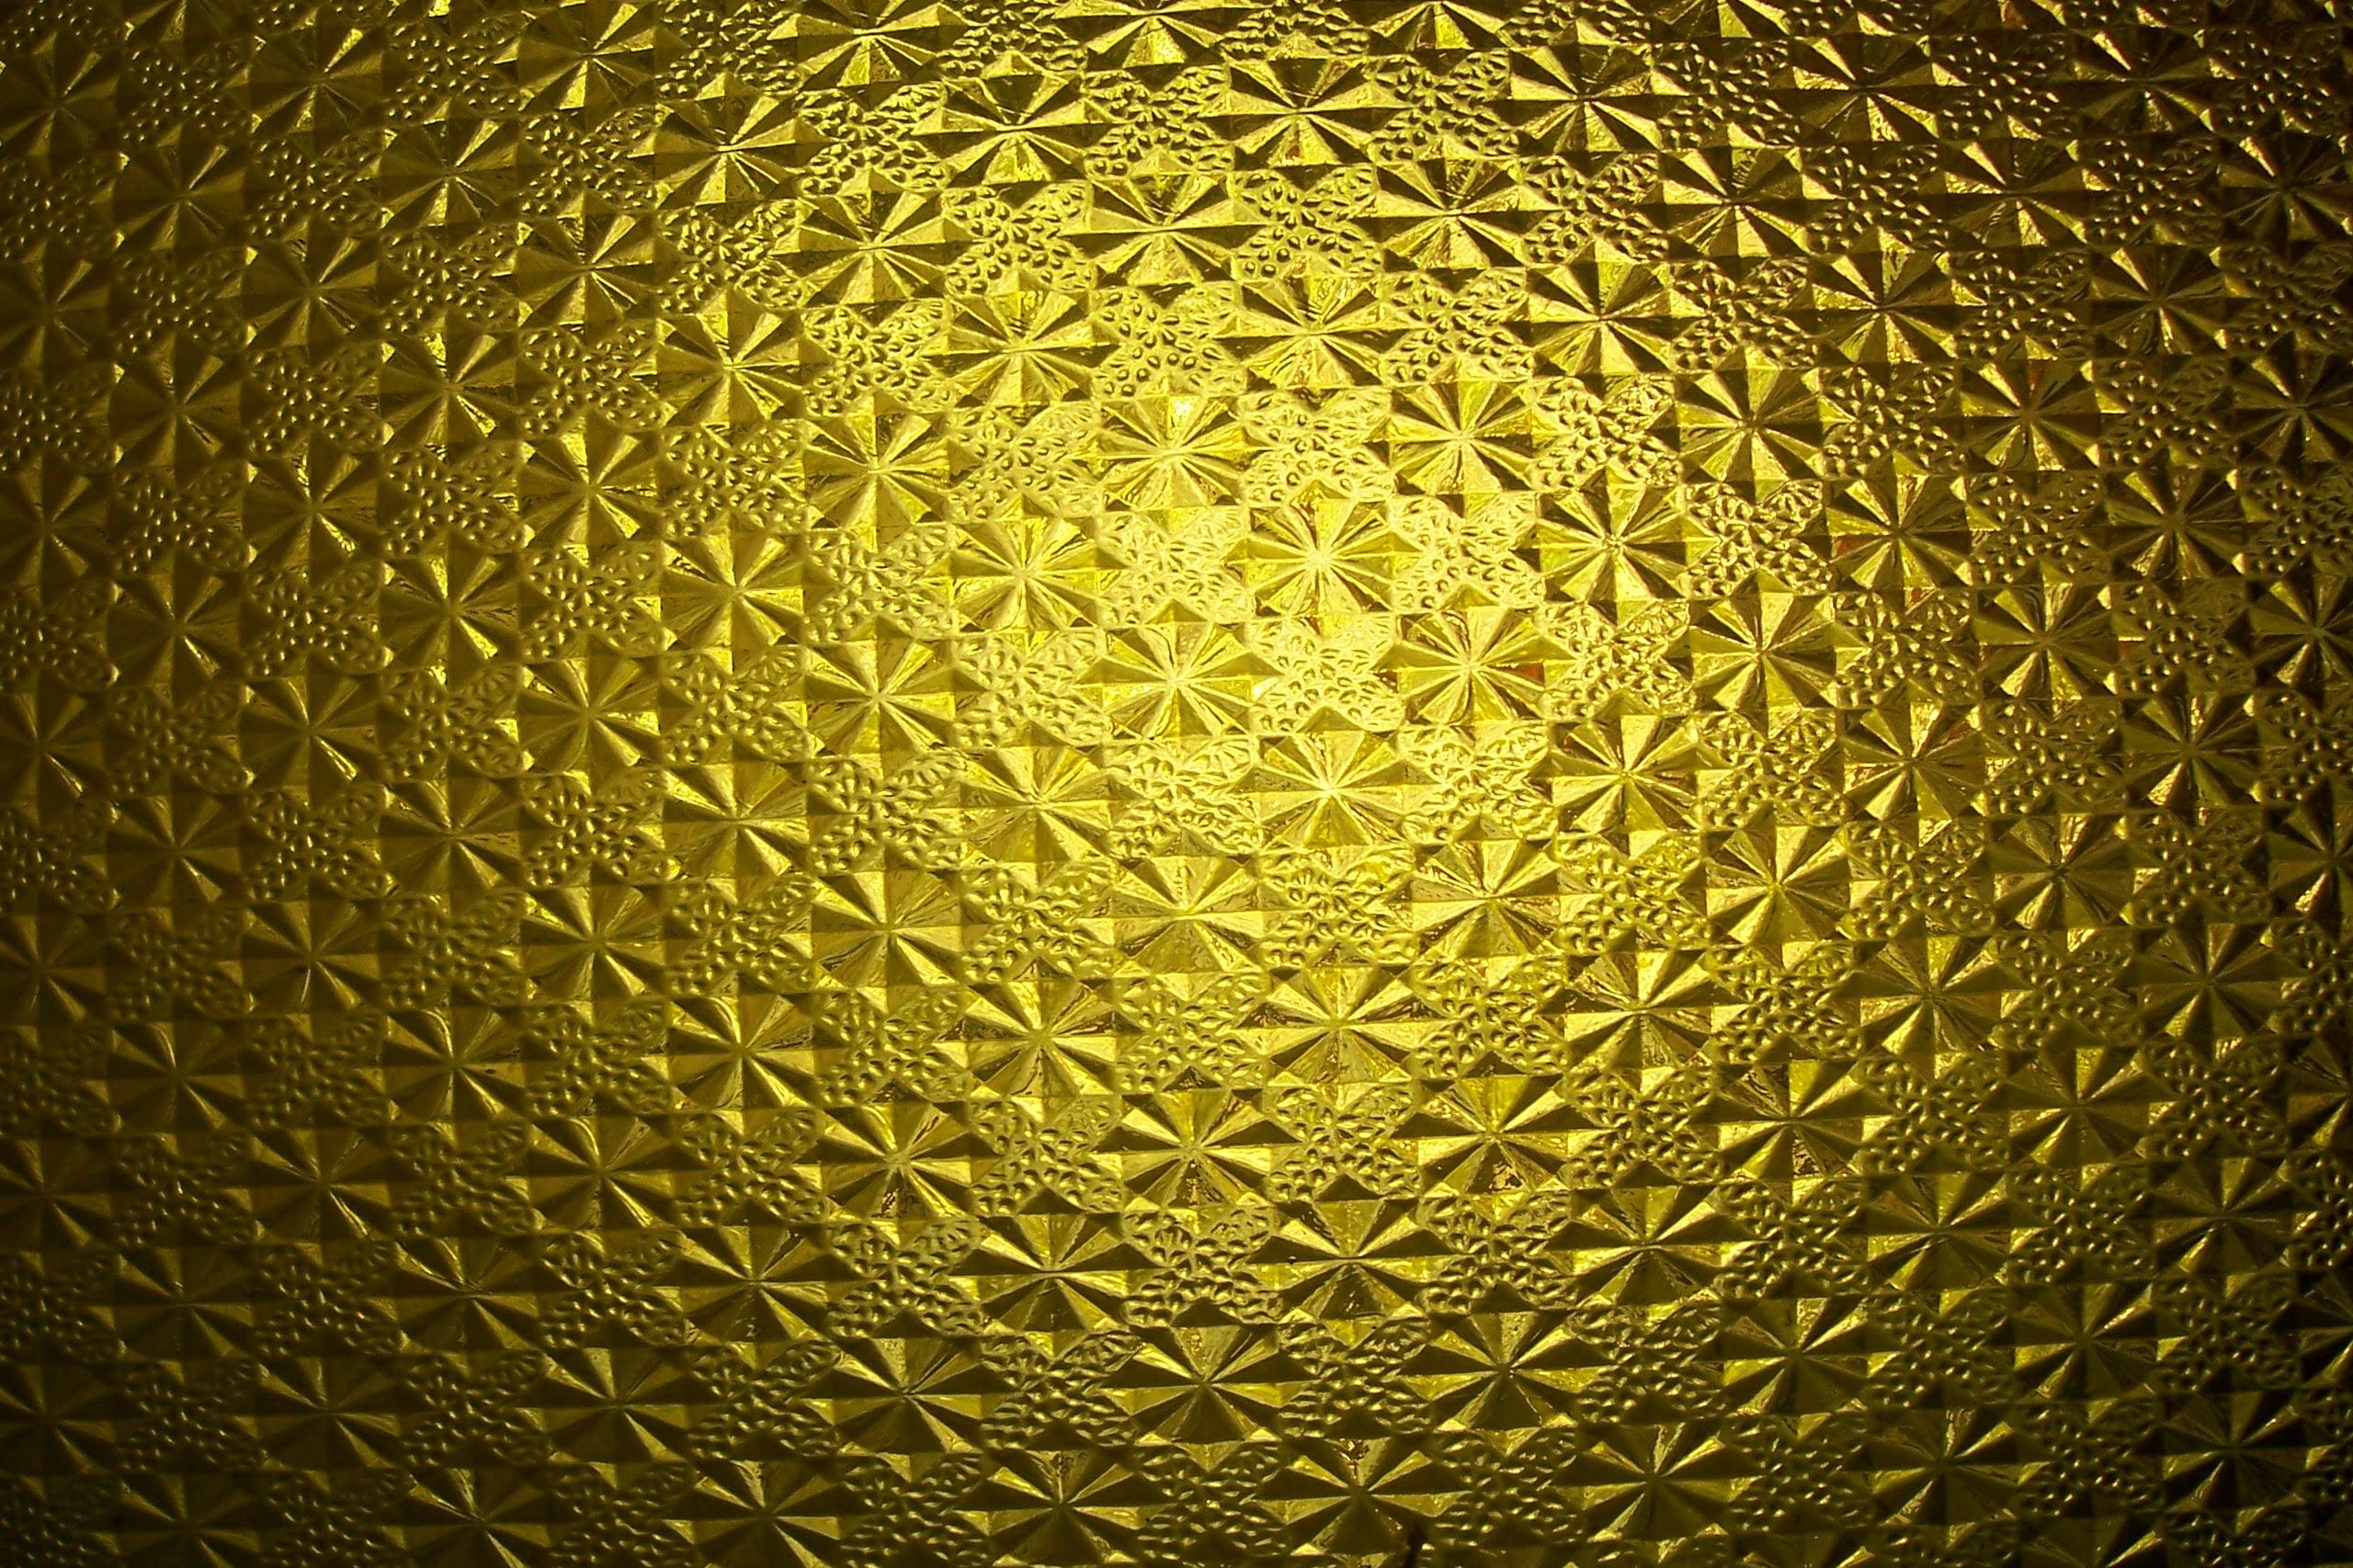 Black And Gold Wallpaper Android 1 Background  Hdblackwallpaper.com